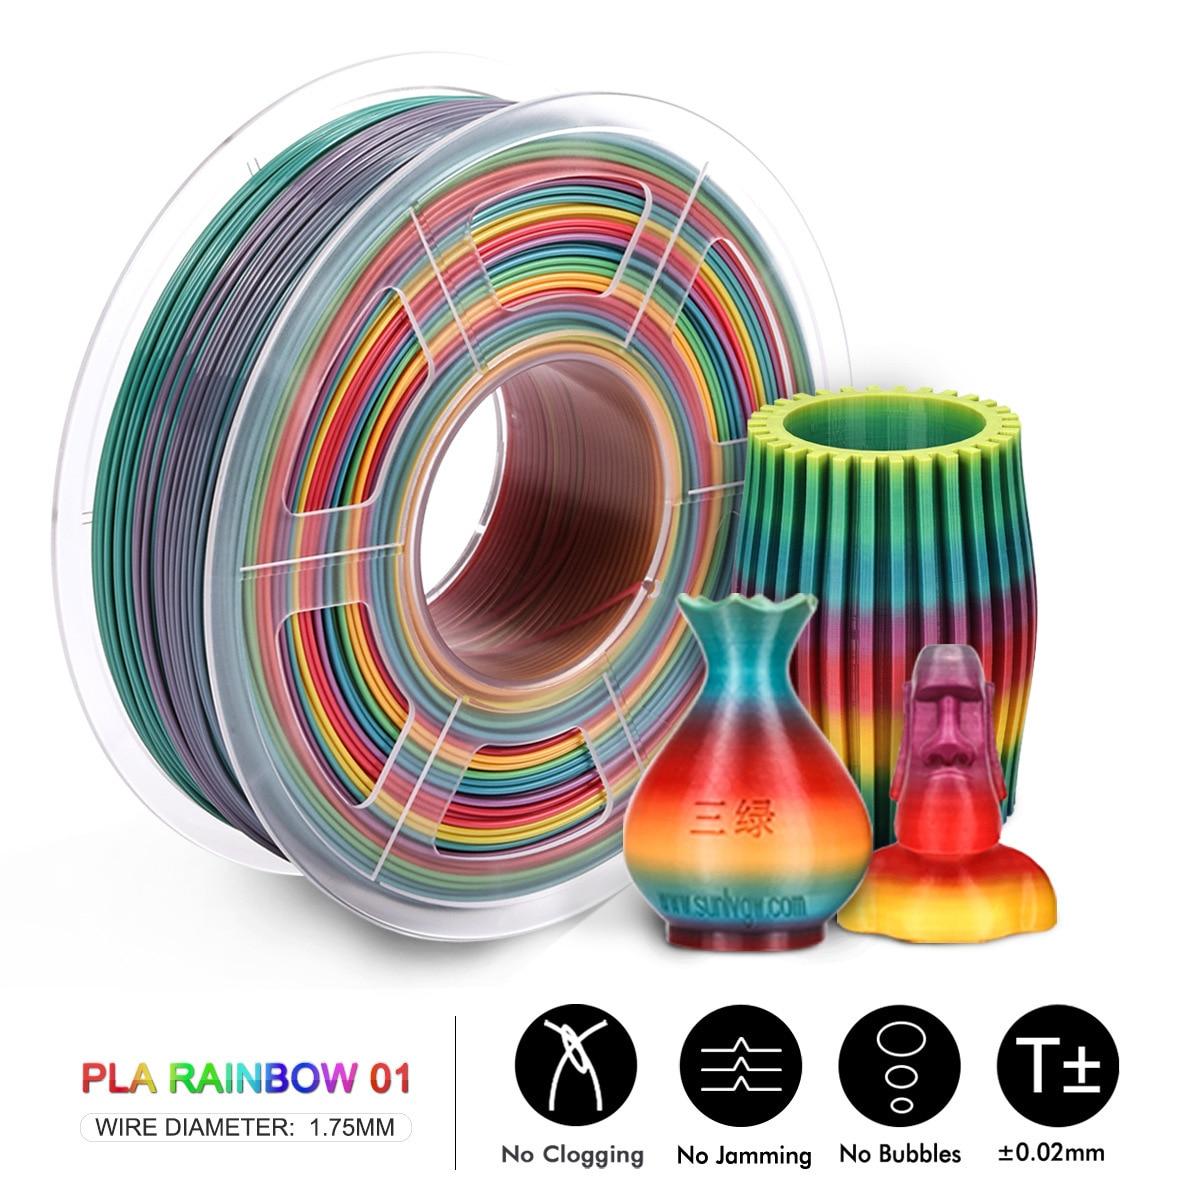 SUNLU 1.75mm PLA Rainbow color 3D printer Filament 100% no bubble with Vacuum bag packing Tolerance +/-0.02mm